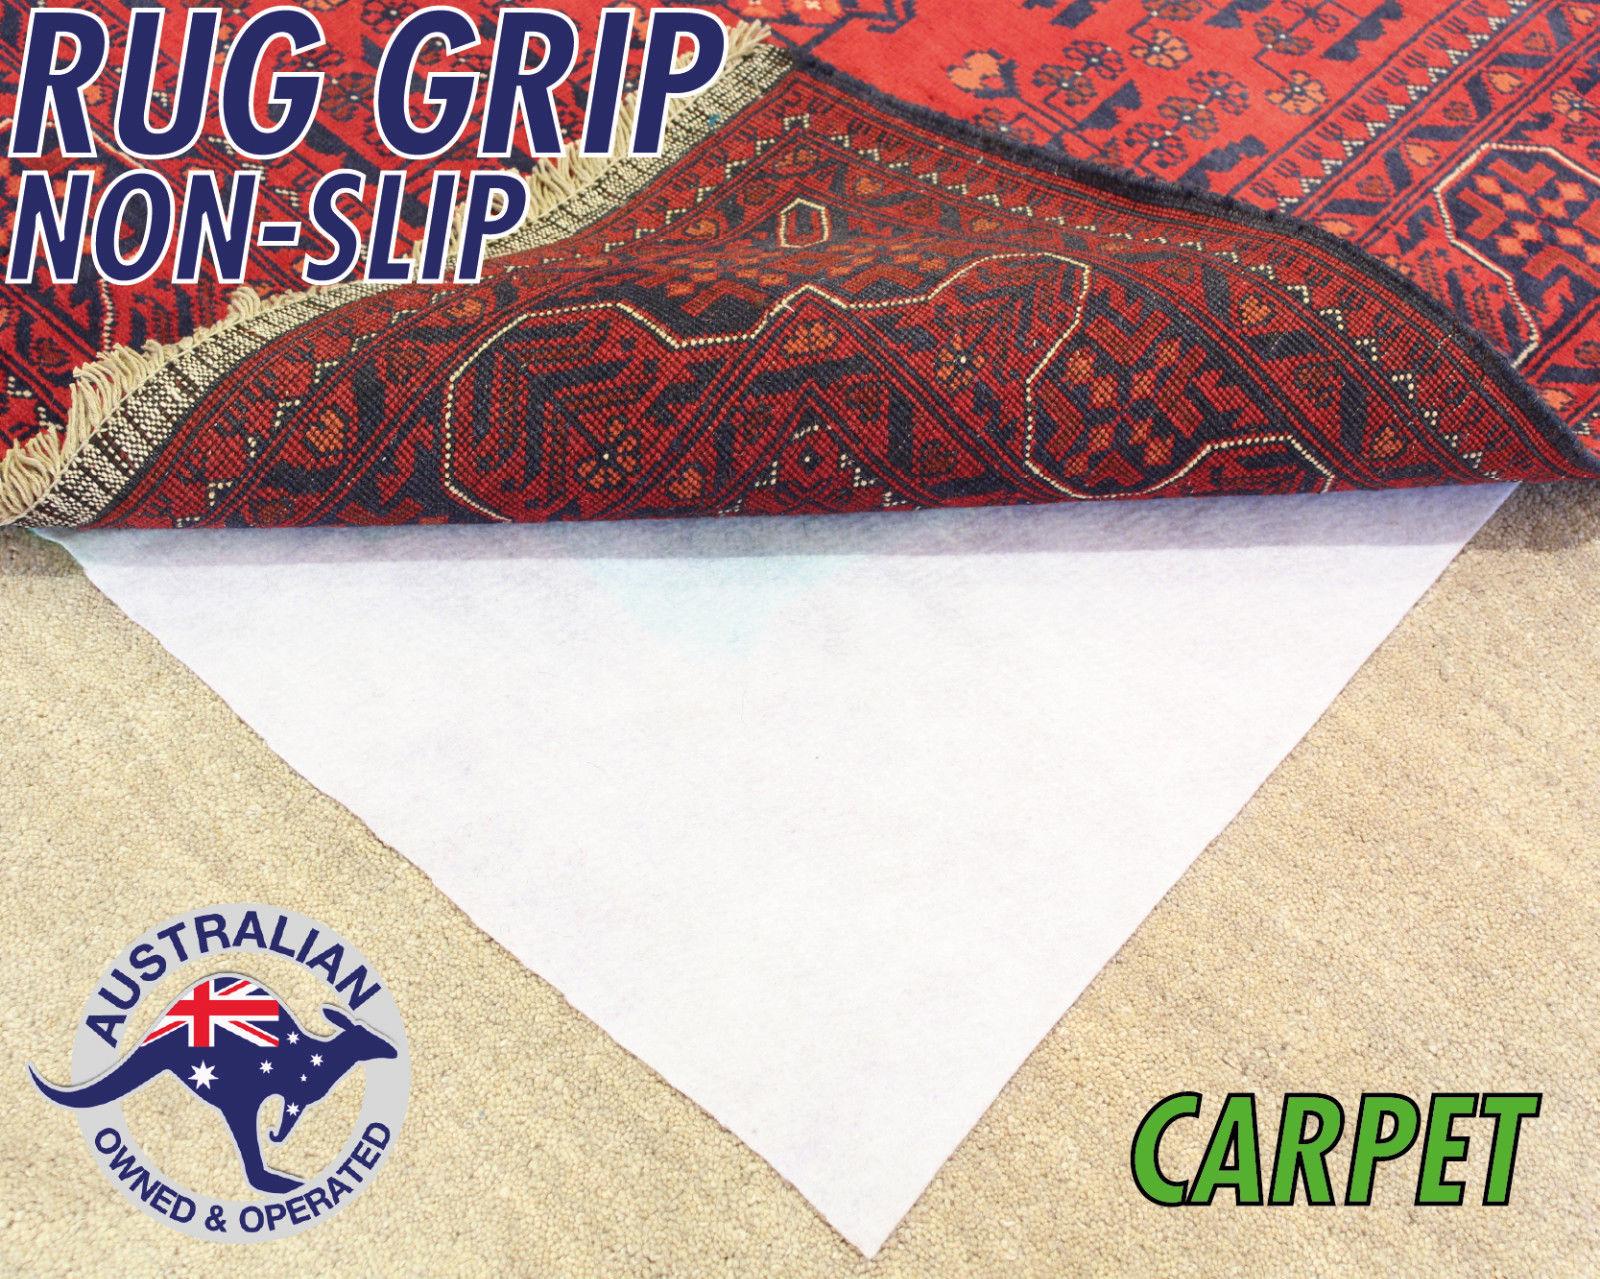 Extra Carpet On Carpet Rug Grip Non Slip Underlay Pad